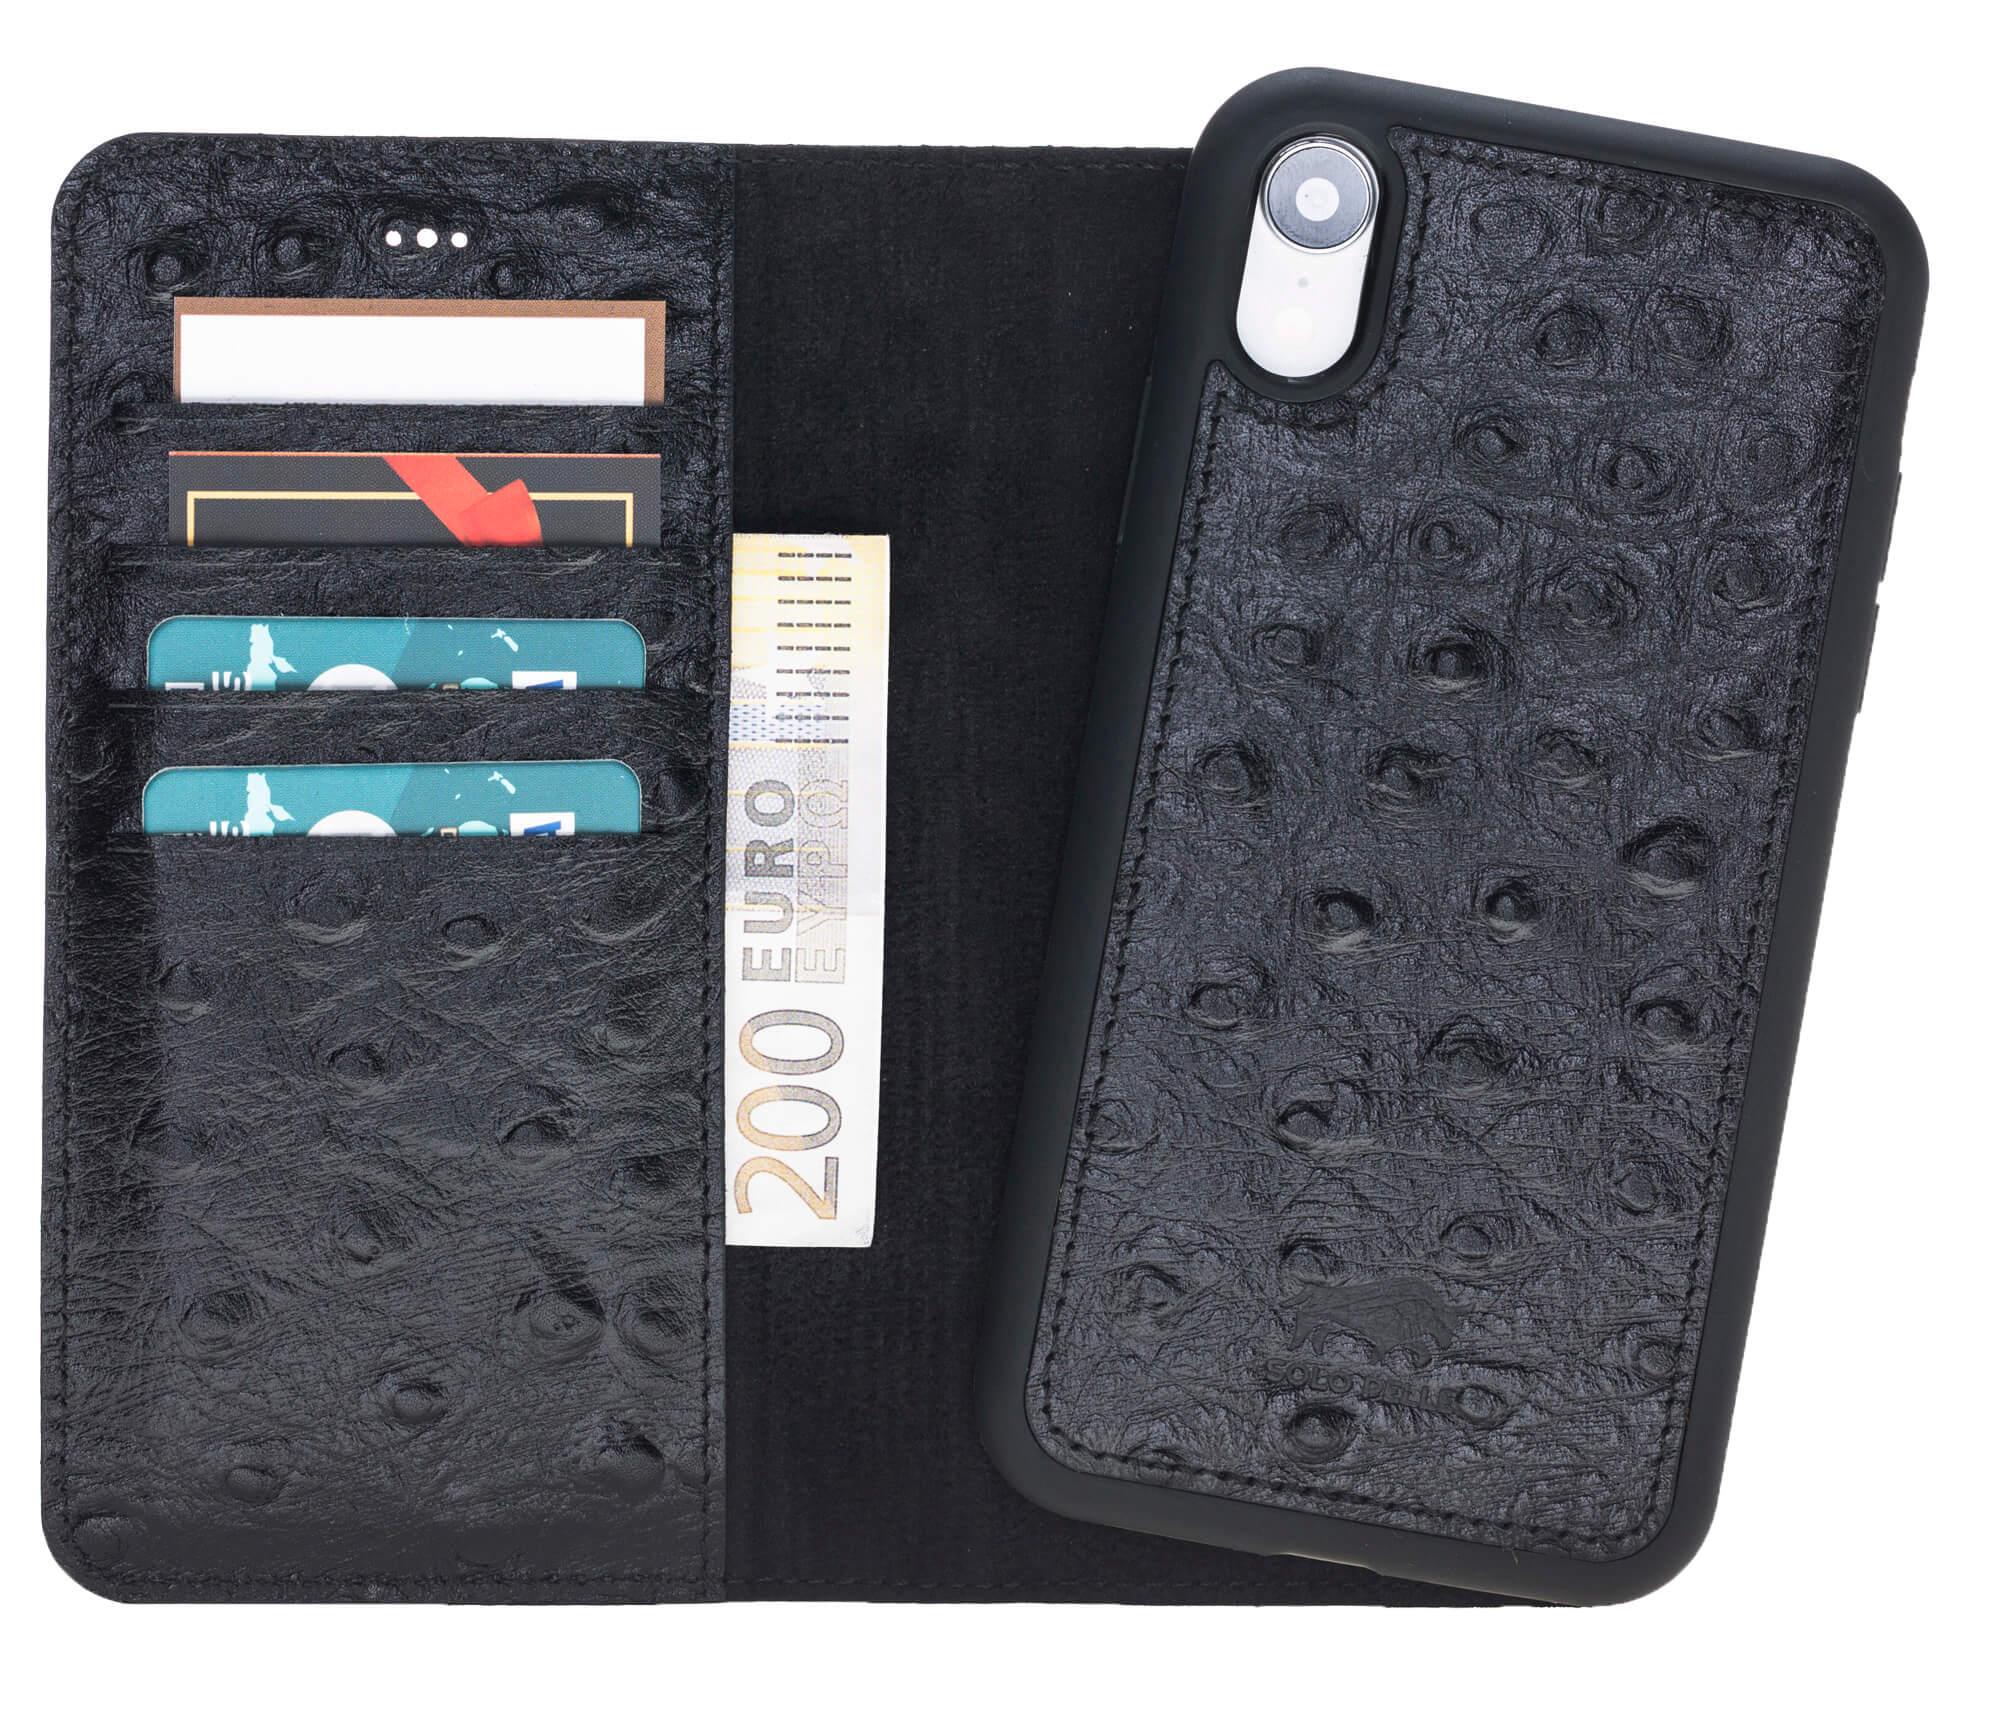 iPhone XR 6.1 Zoll Abnehmbare Lederhülle (2in1) in Straussprägung Schwarz